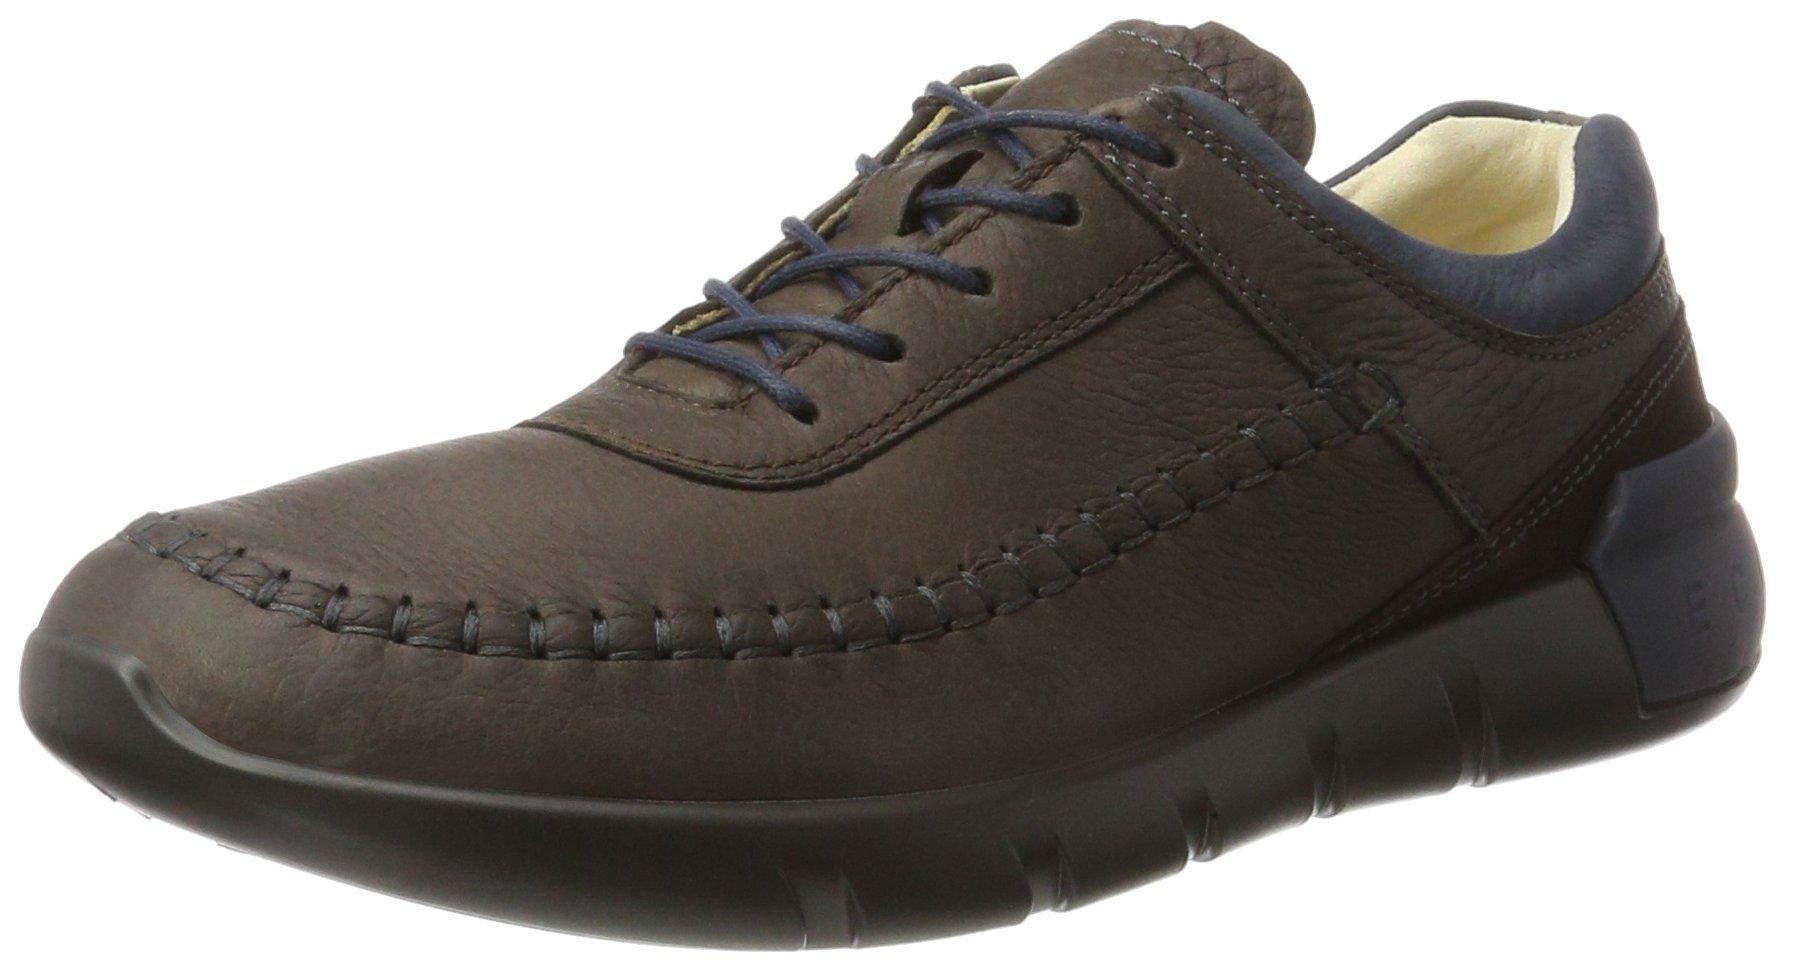 ECCO Men's Cross X Classic Fashion Sneaker, Coffee/Marine/Coffee, 41 M EU/7-7.5 D(M) US